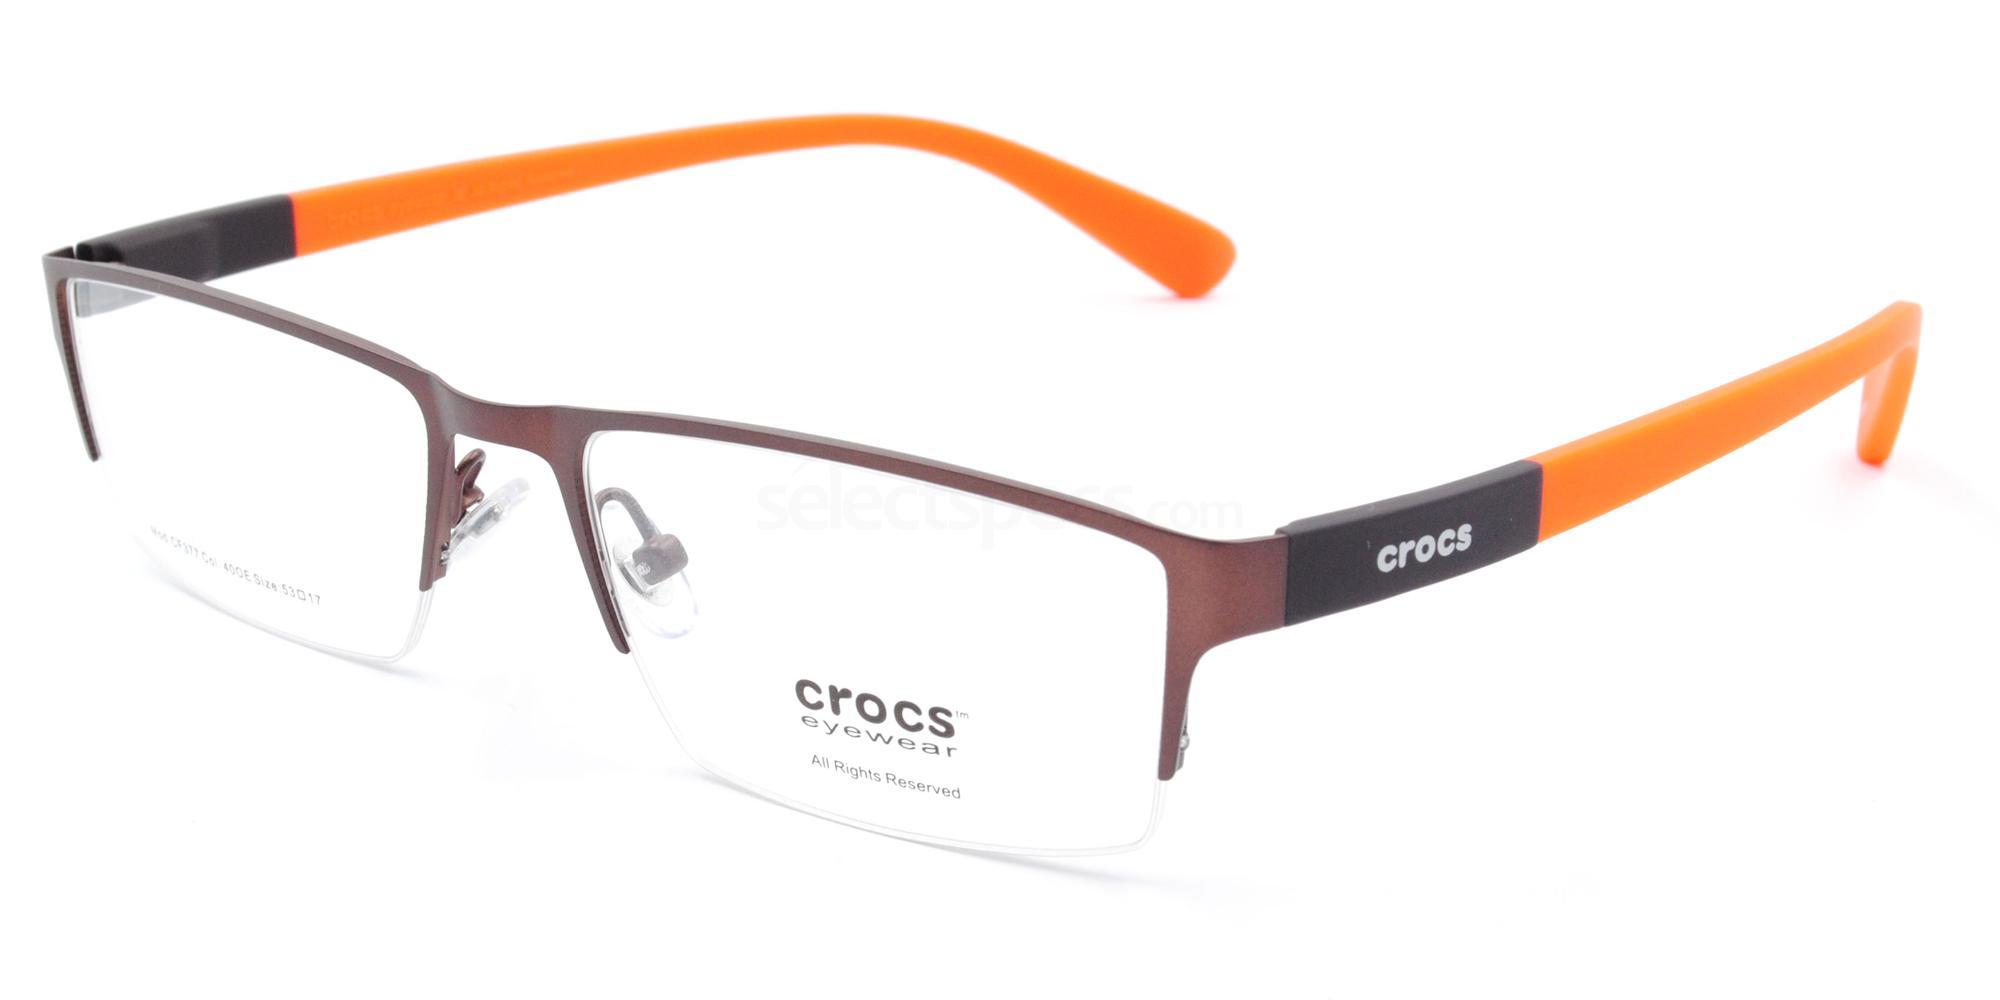 40OE CF 377 Glasses, Crocs Eyewear